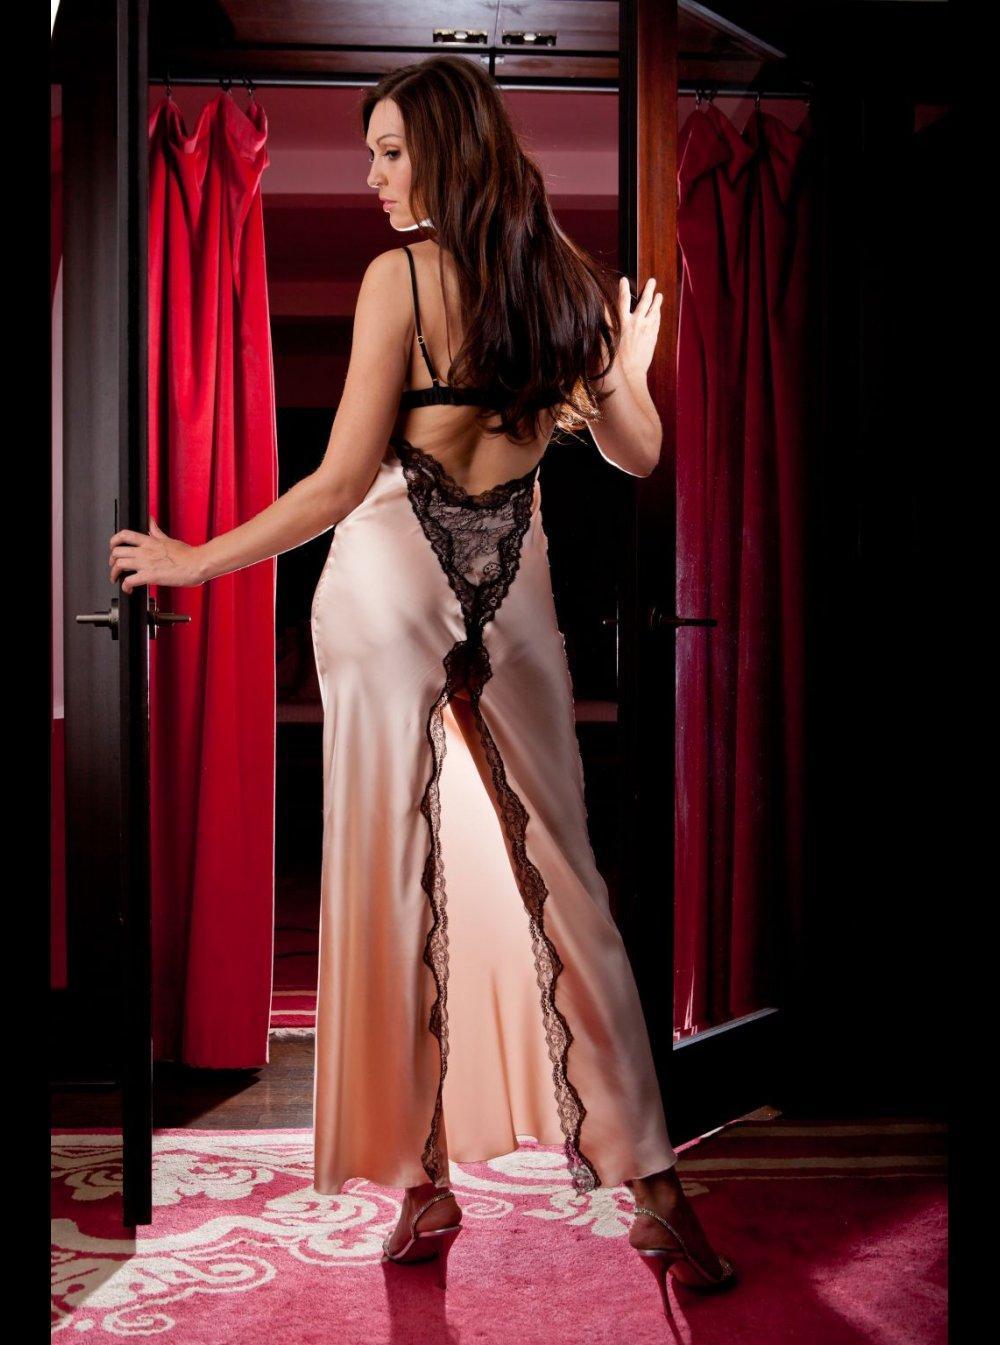 e24f5ddff8 Jane Woolrich - Silk Nightdress - 8276